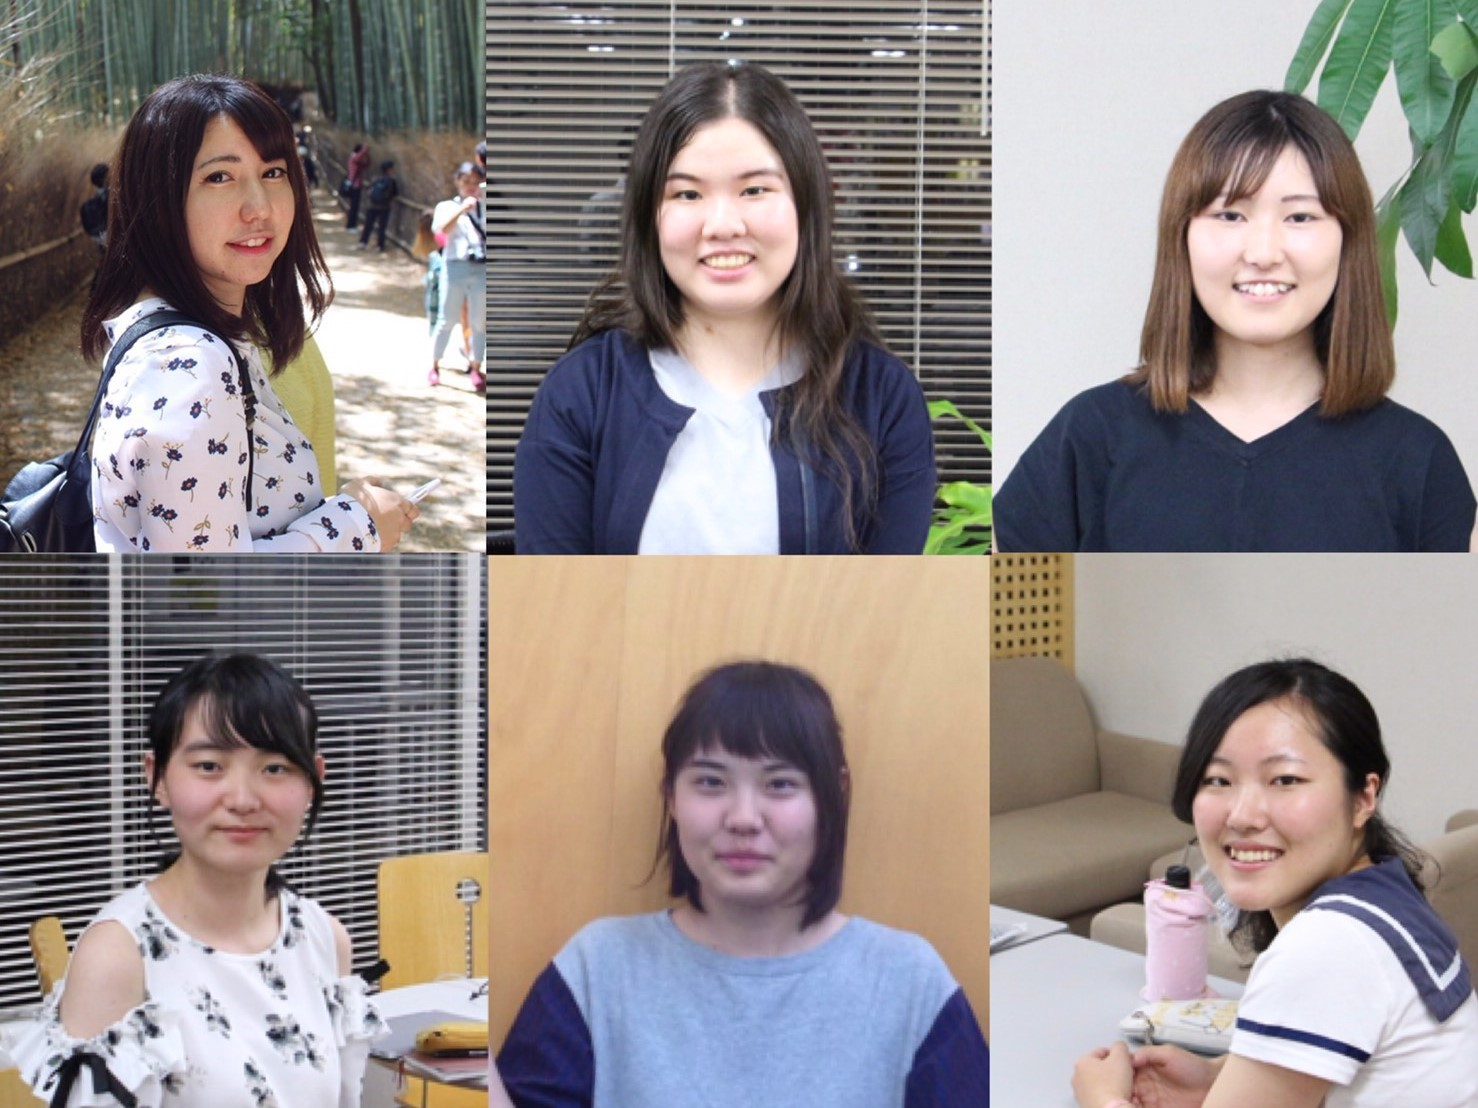 【vol.1】抜き打ちチェック!大学生のカバンの中身は?【女子編】